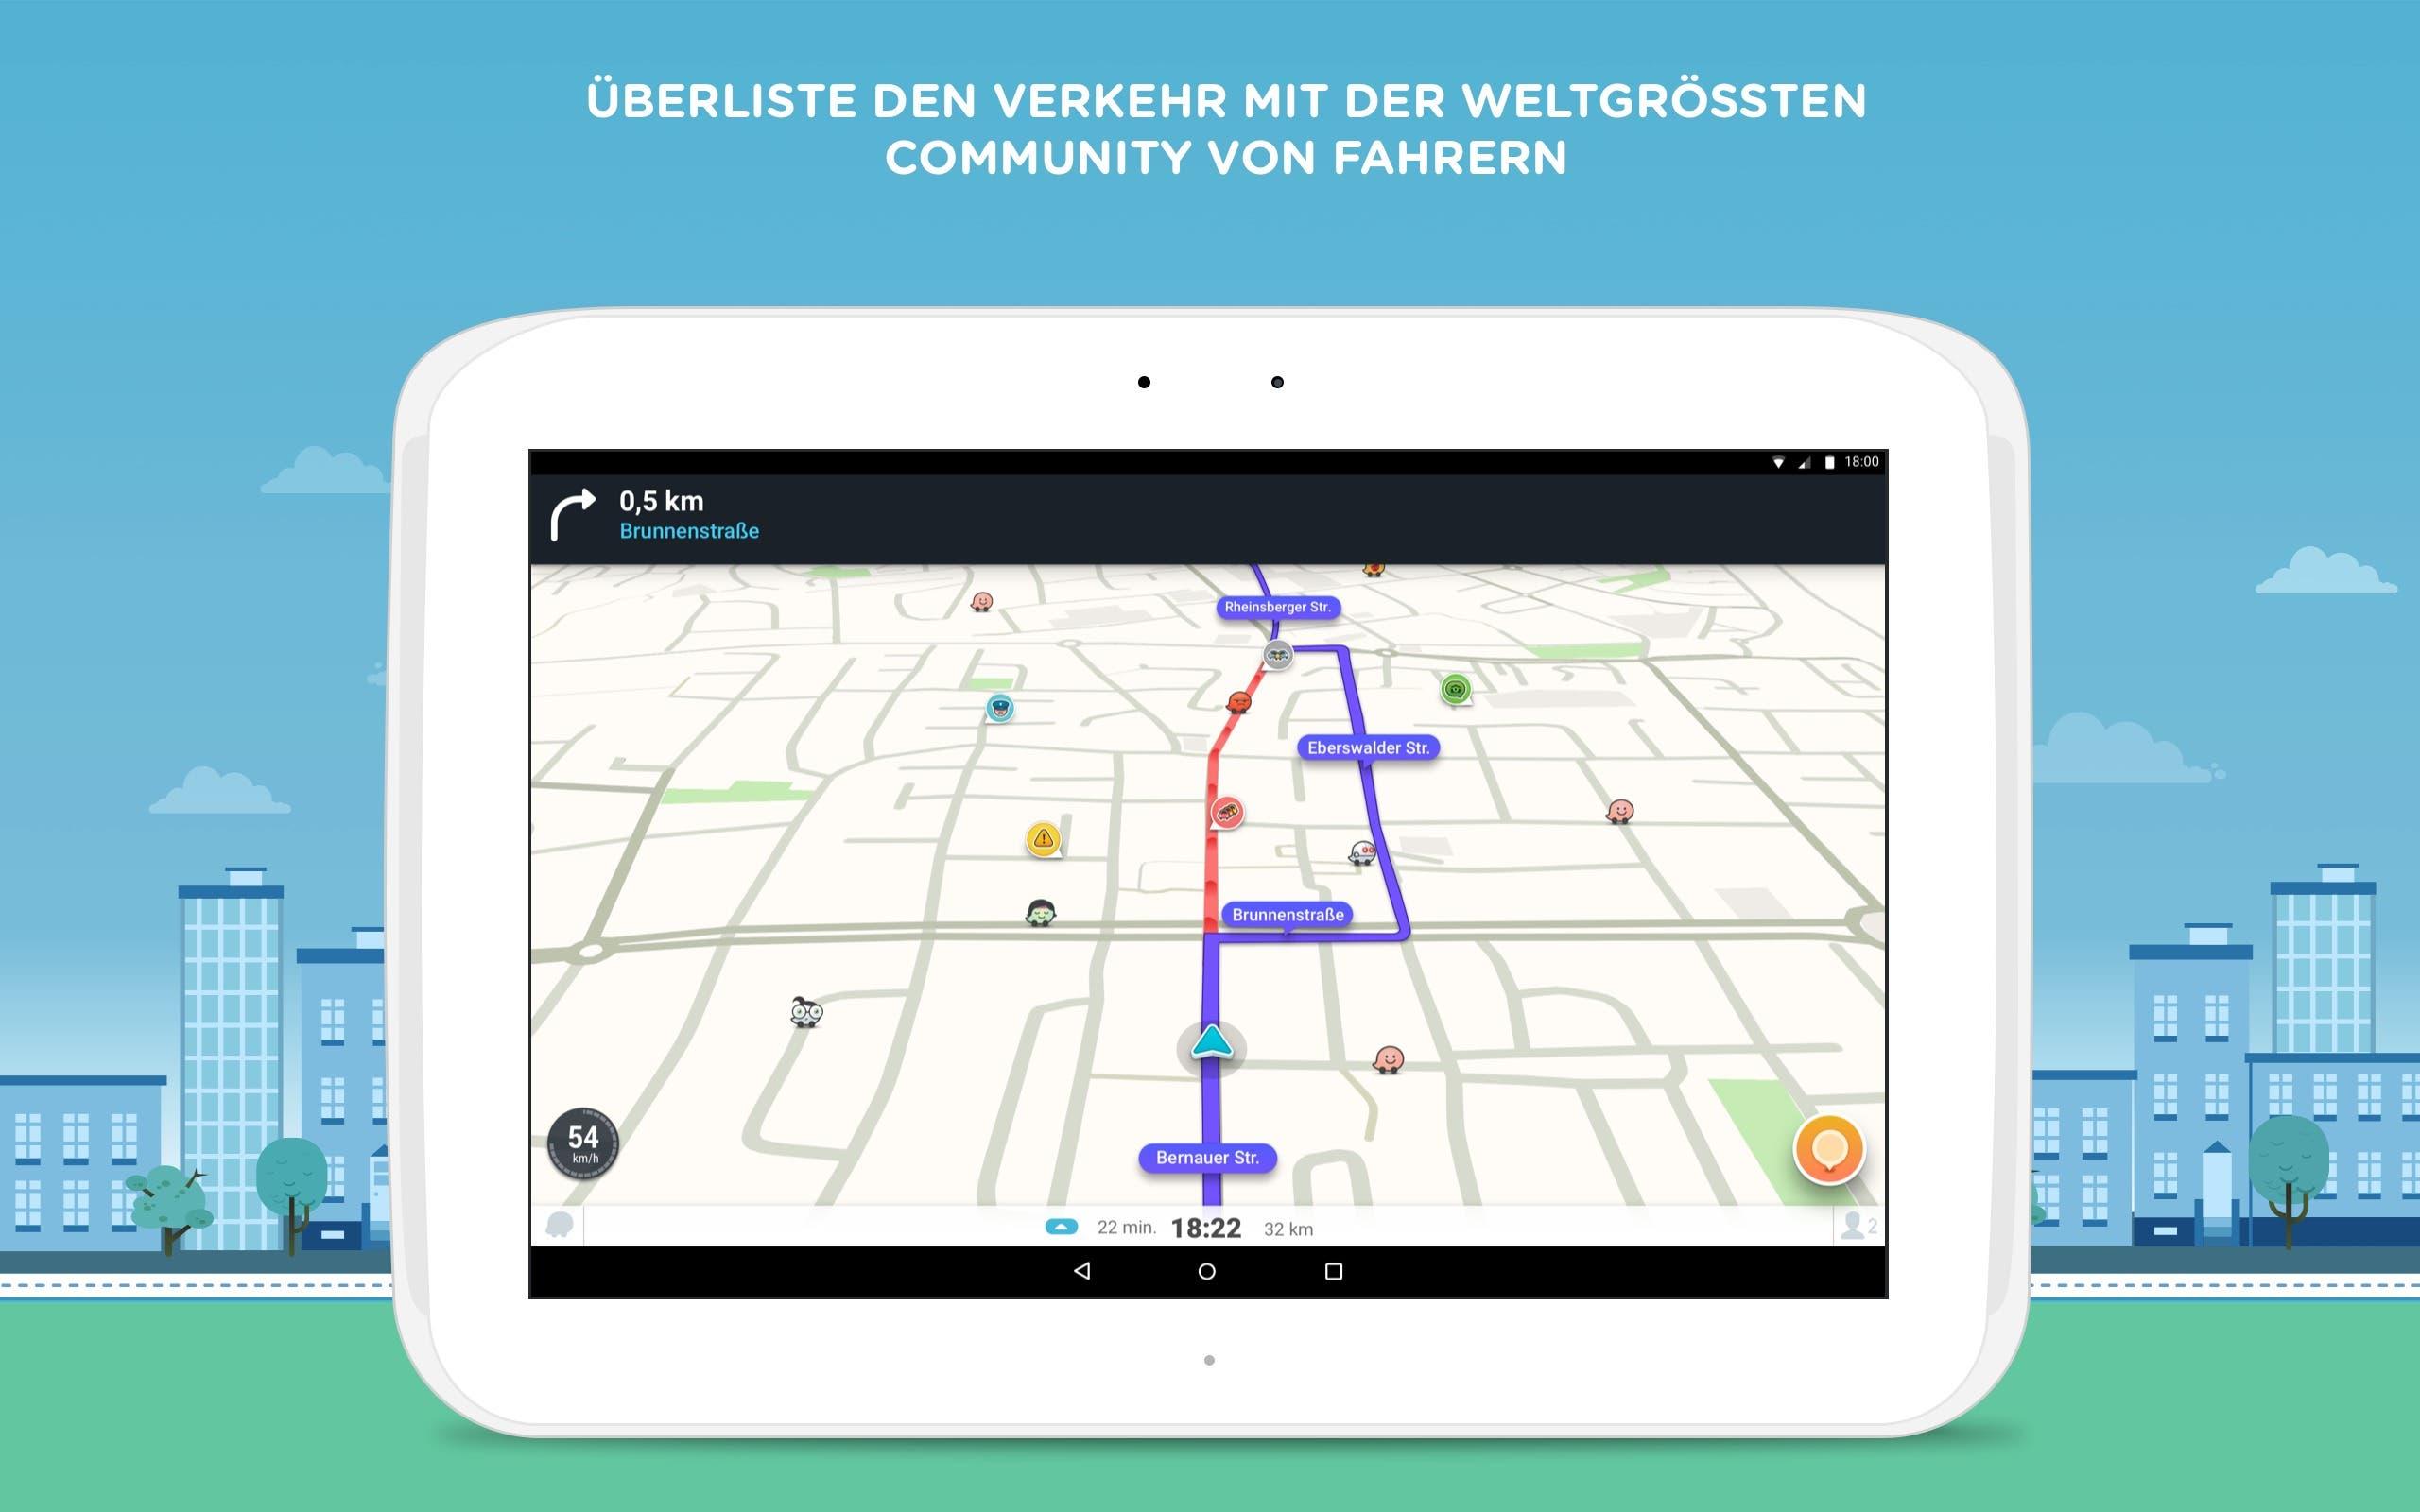 Kostenlose Navi-App Waze